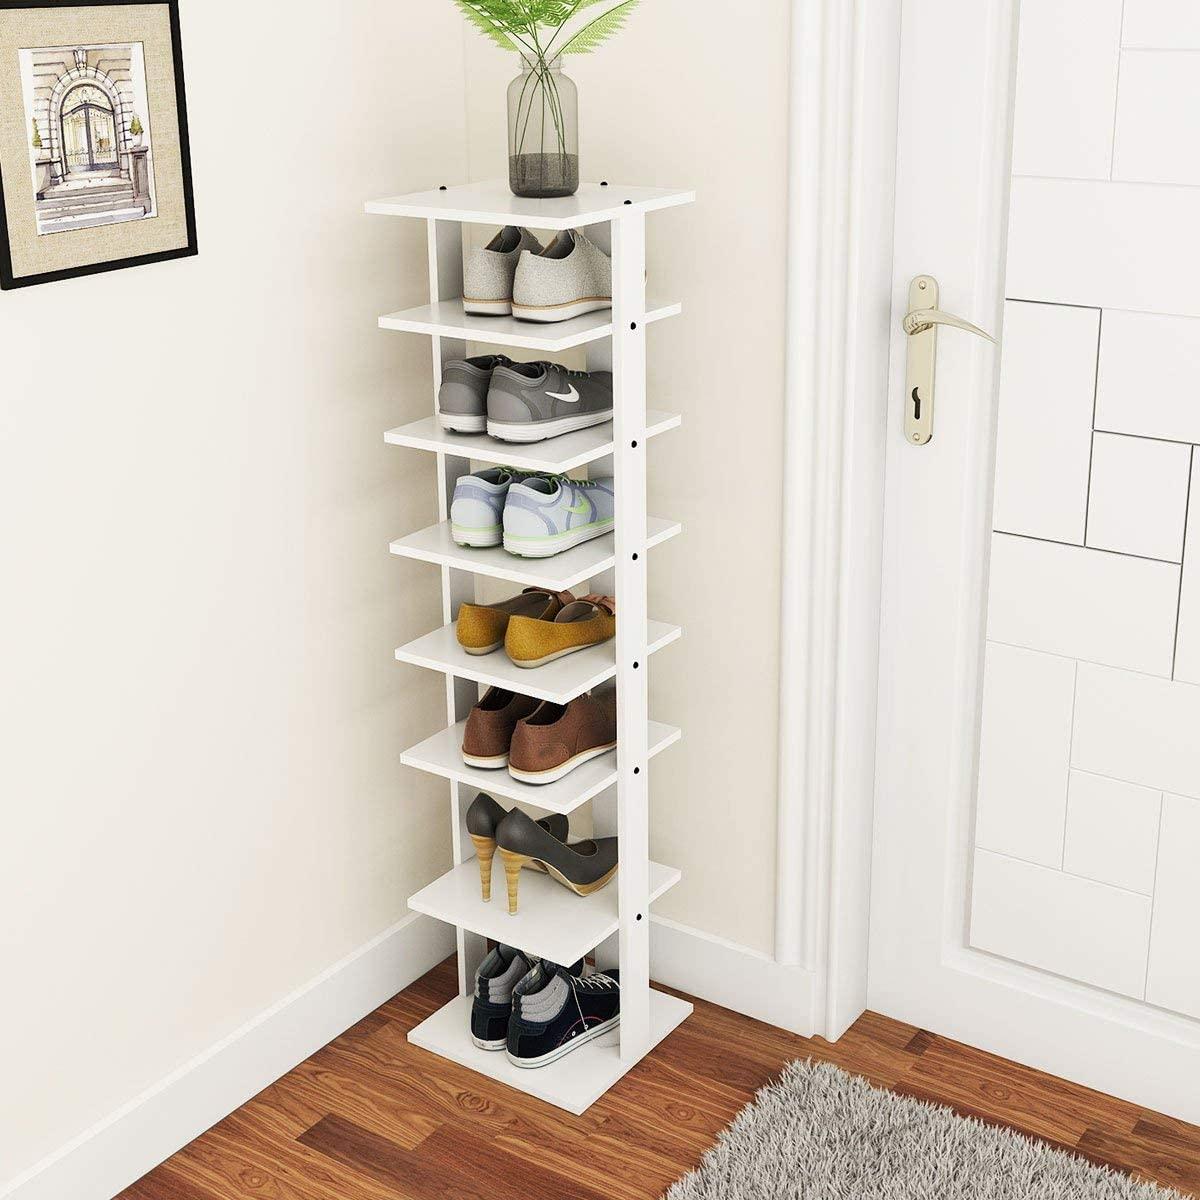 Tangkula Wooden shoe Racks, best shoe racks